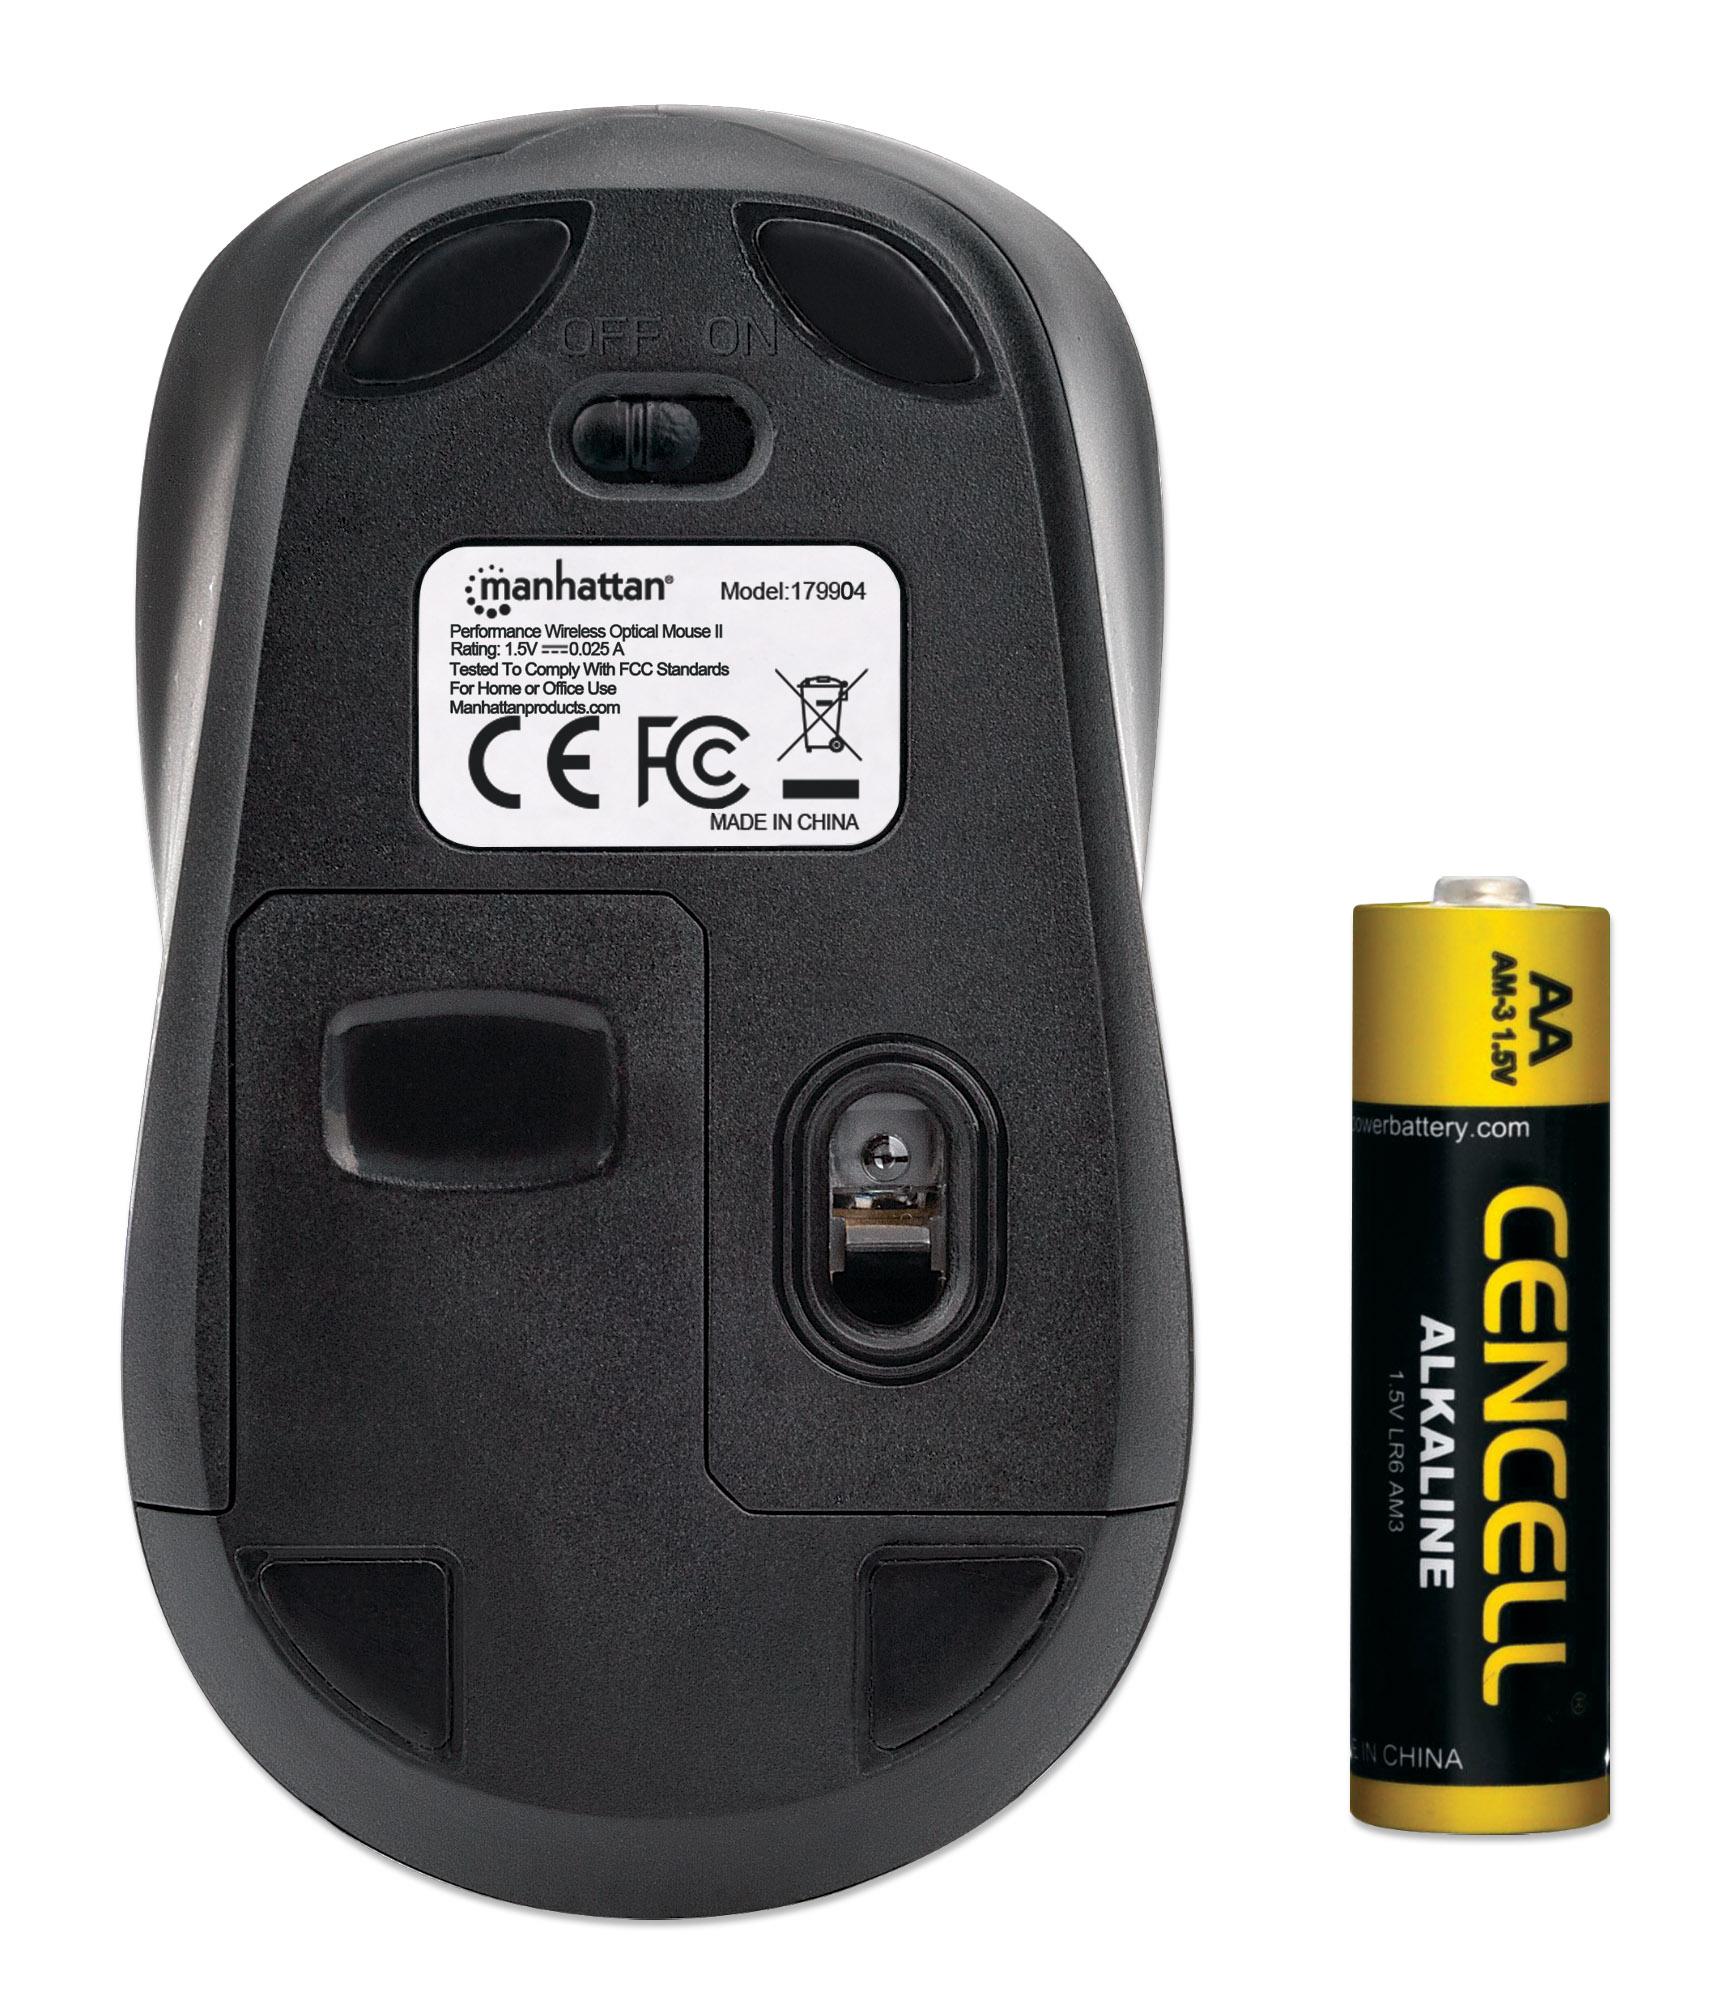 Performance Wireless Optical Mouse II